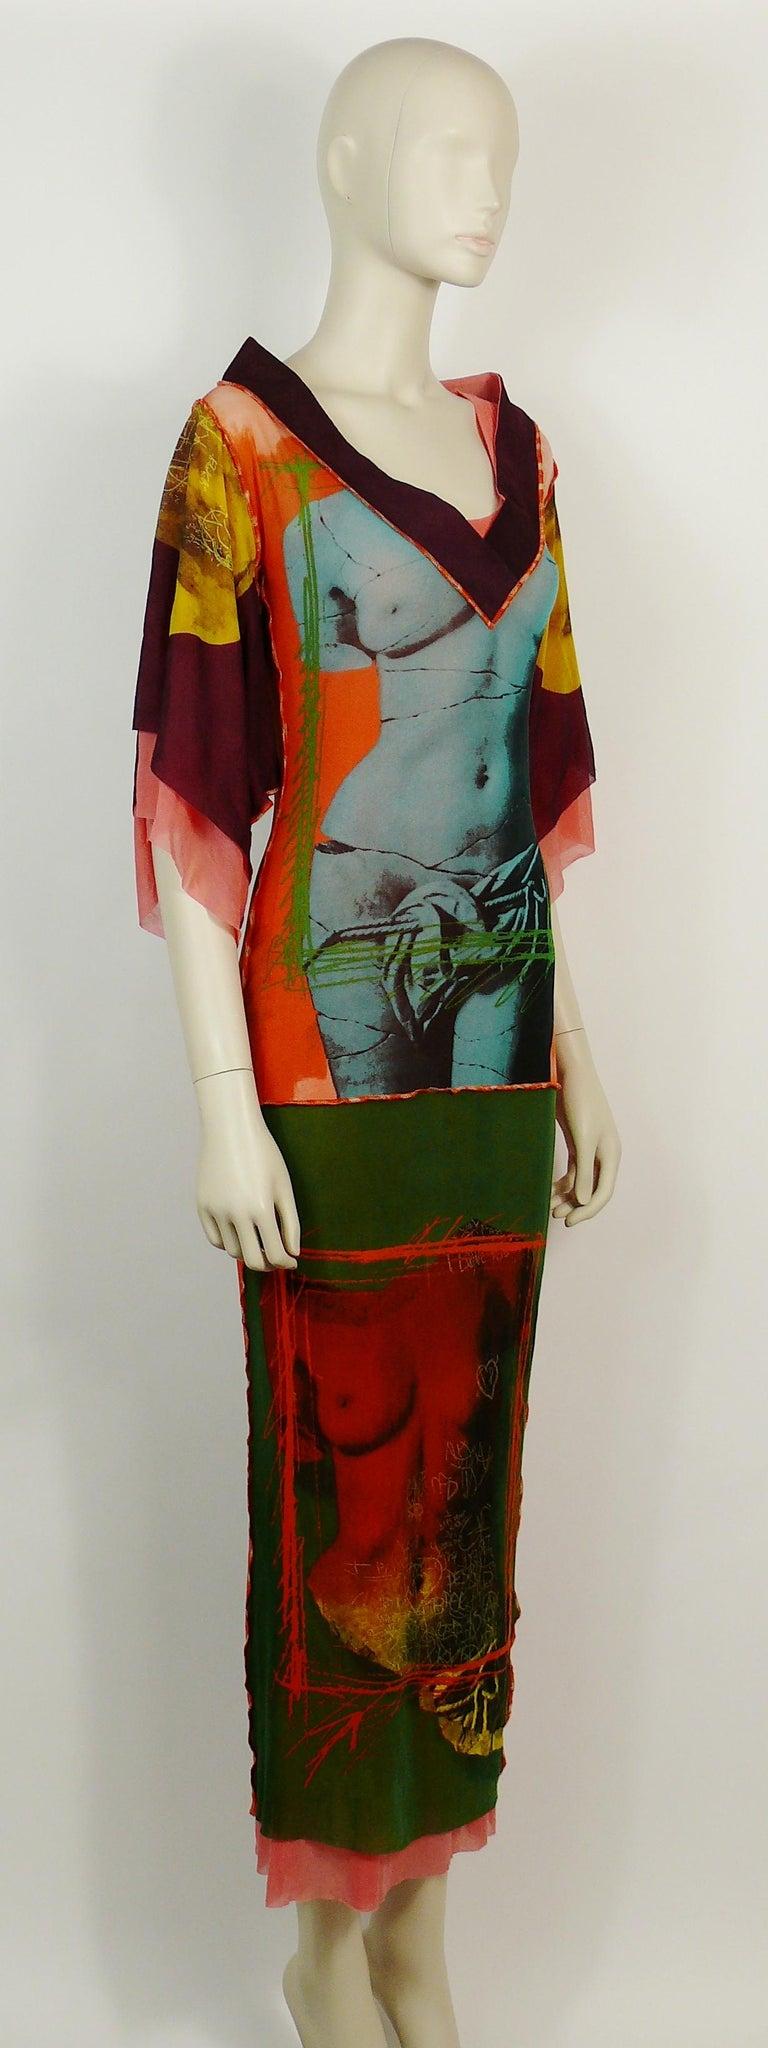 Jean Paul Gaultier Vintage Nude Woman And Snake Club Kid